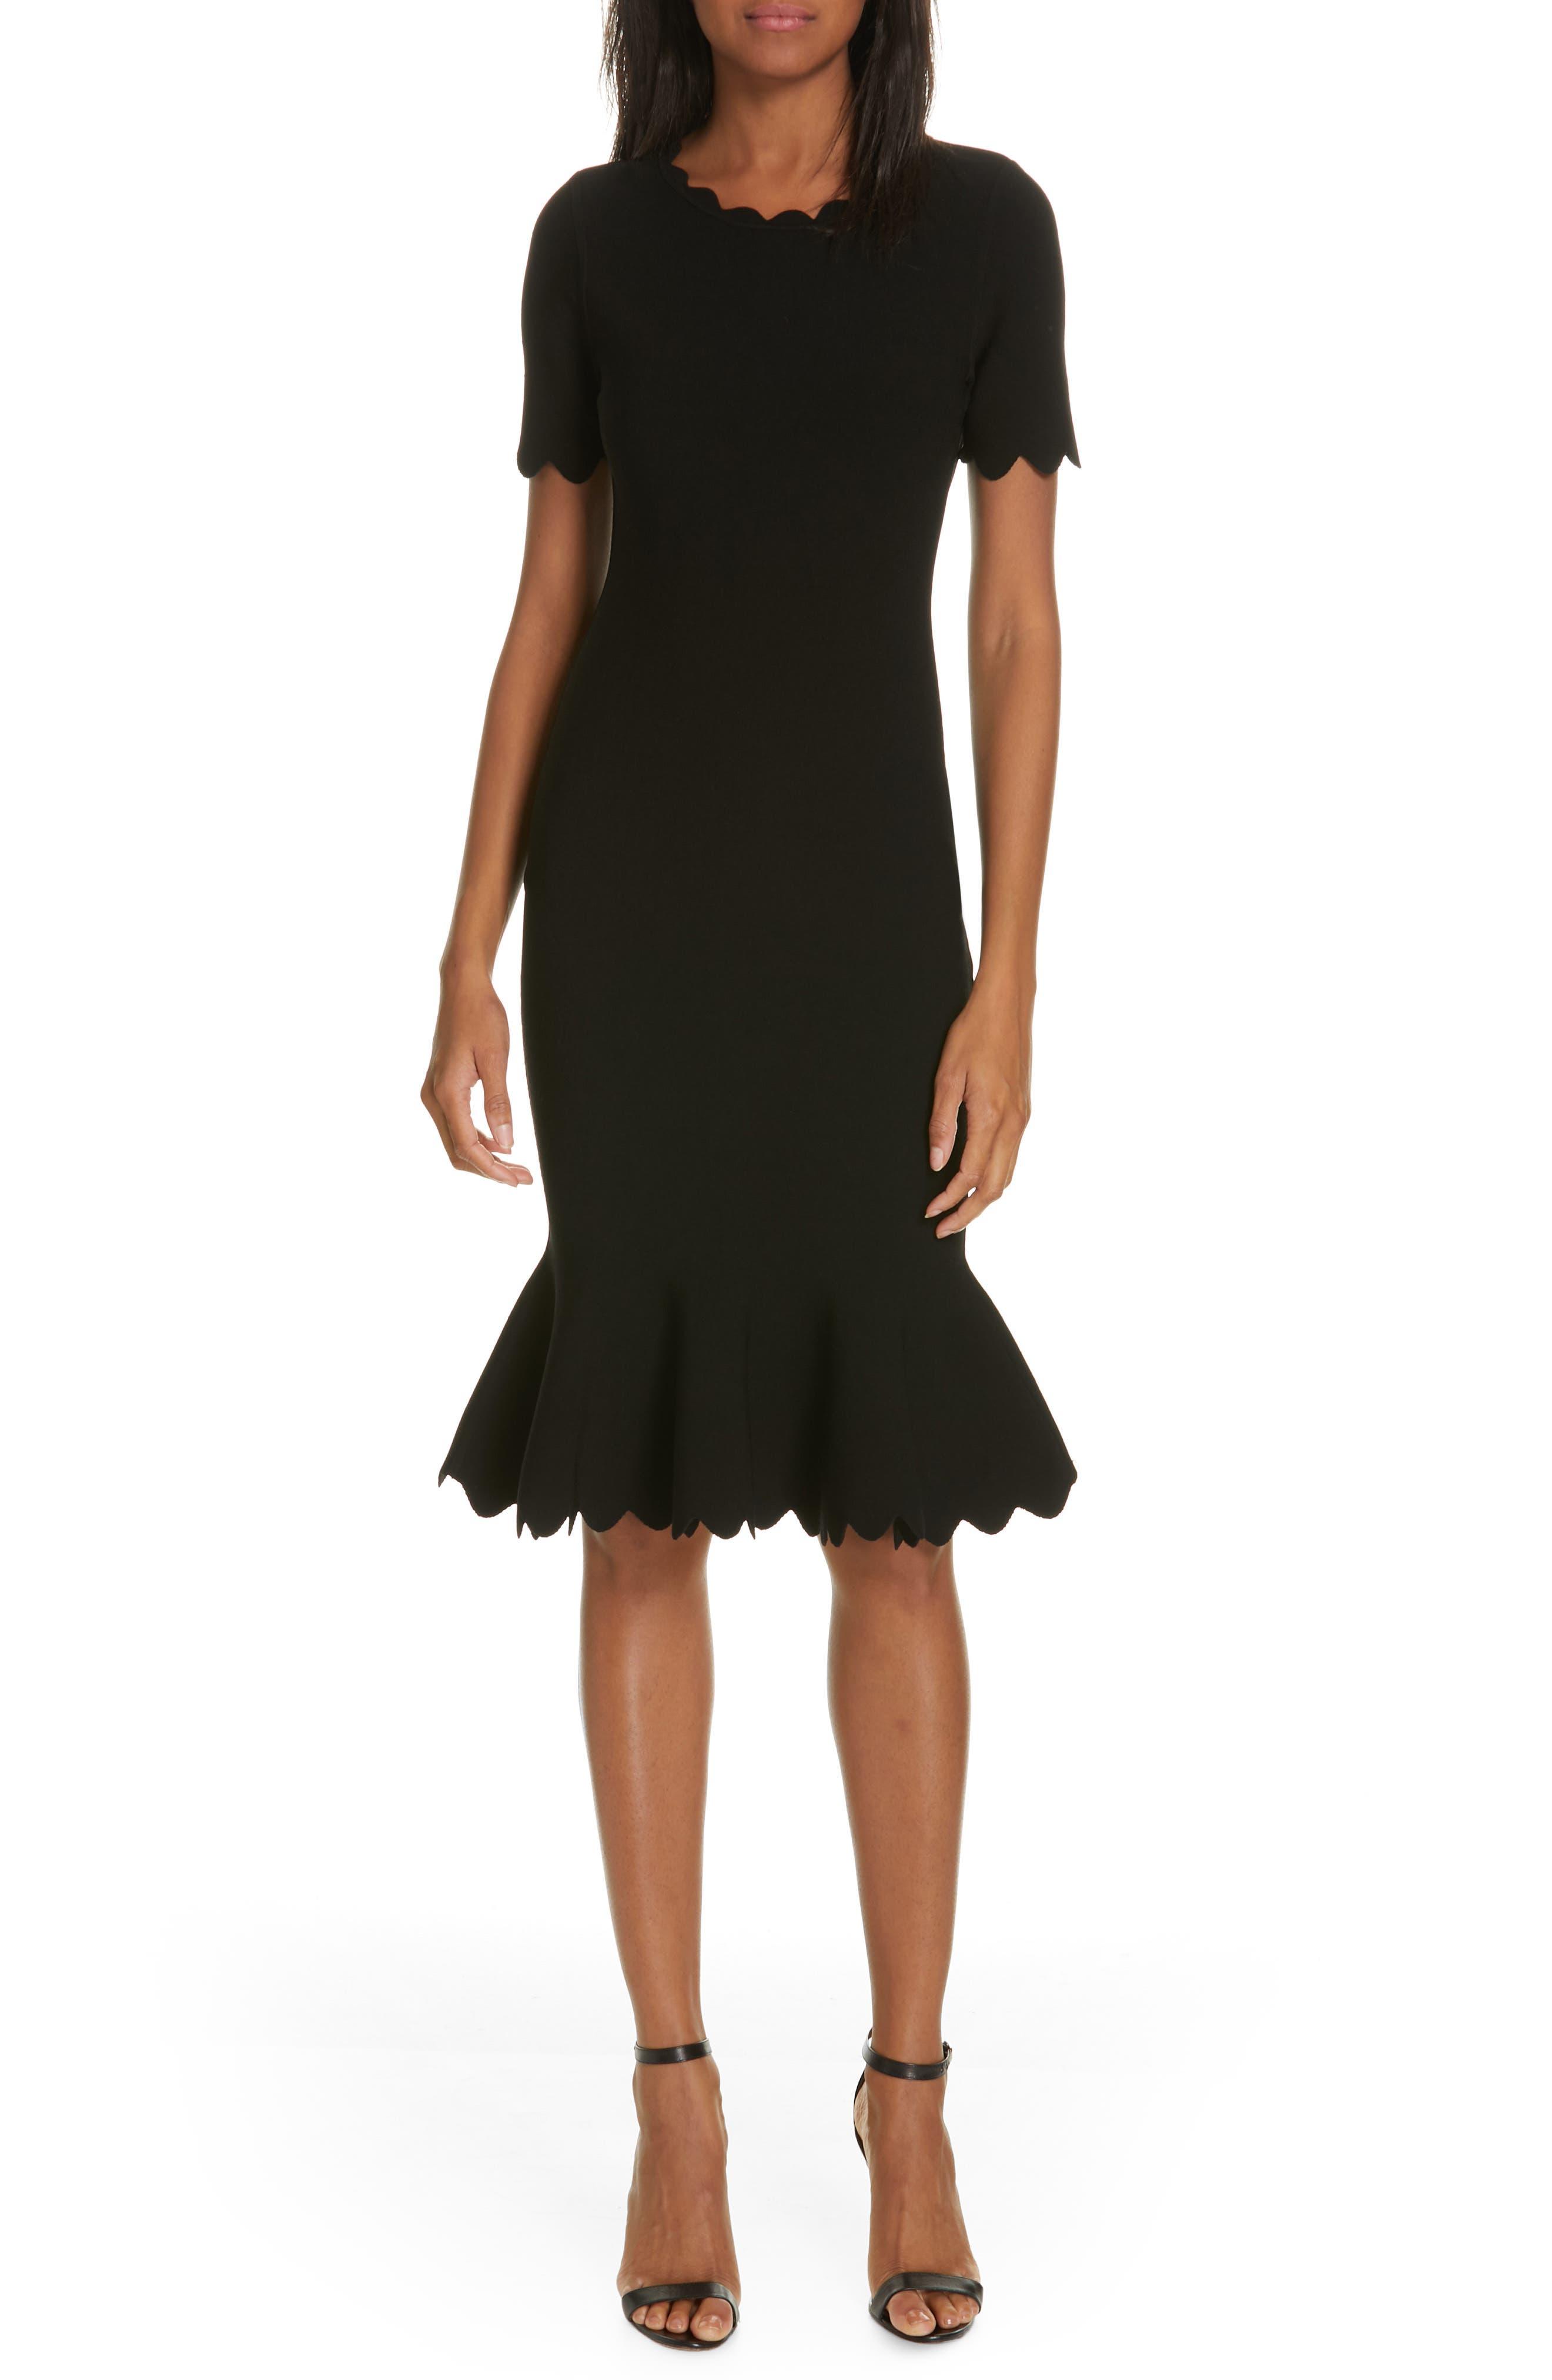 Milly Scallop Trim Mermaid Dress, Black